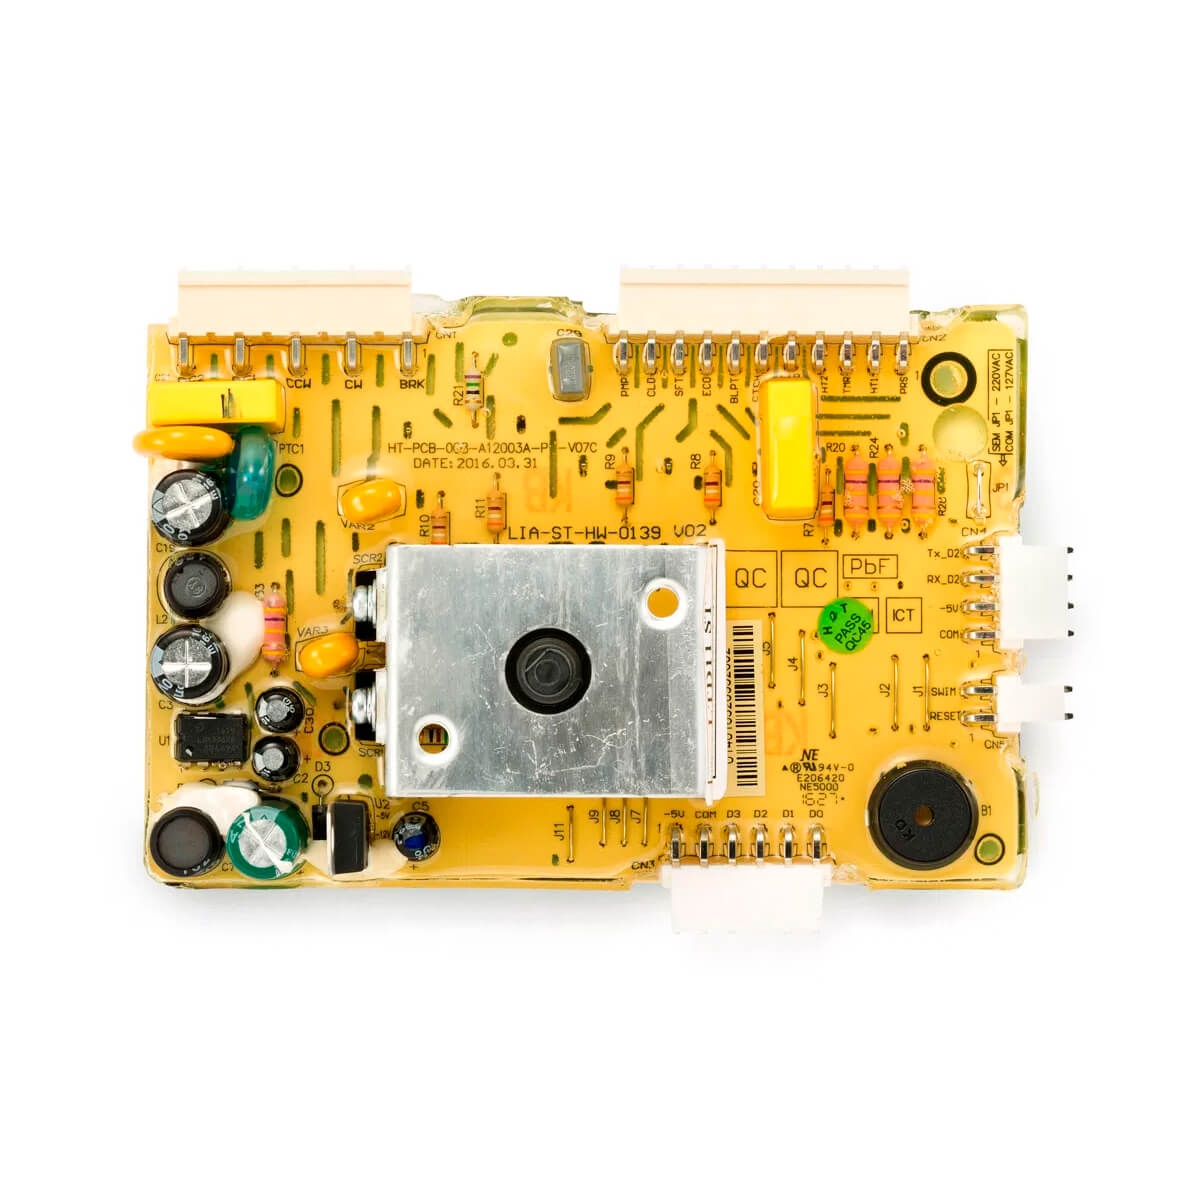 Placa Potência Para Lavadora De Roupas Electrolux LTD11 Bivolt - 70202916